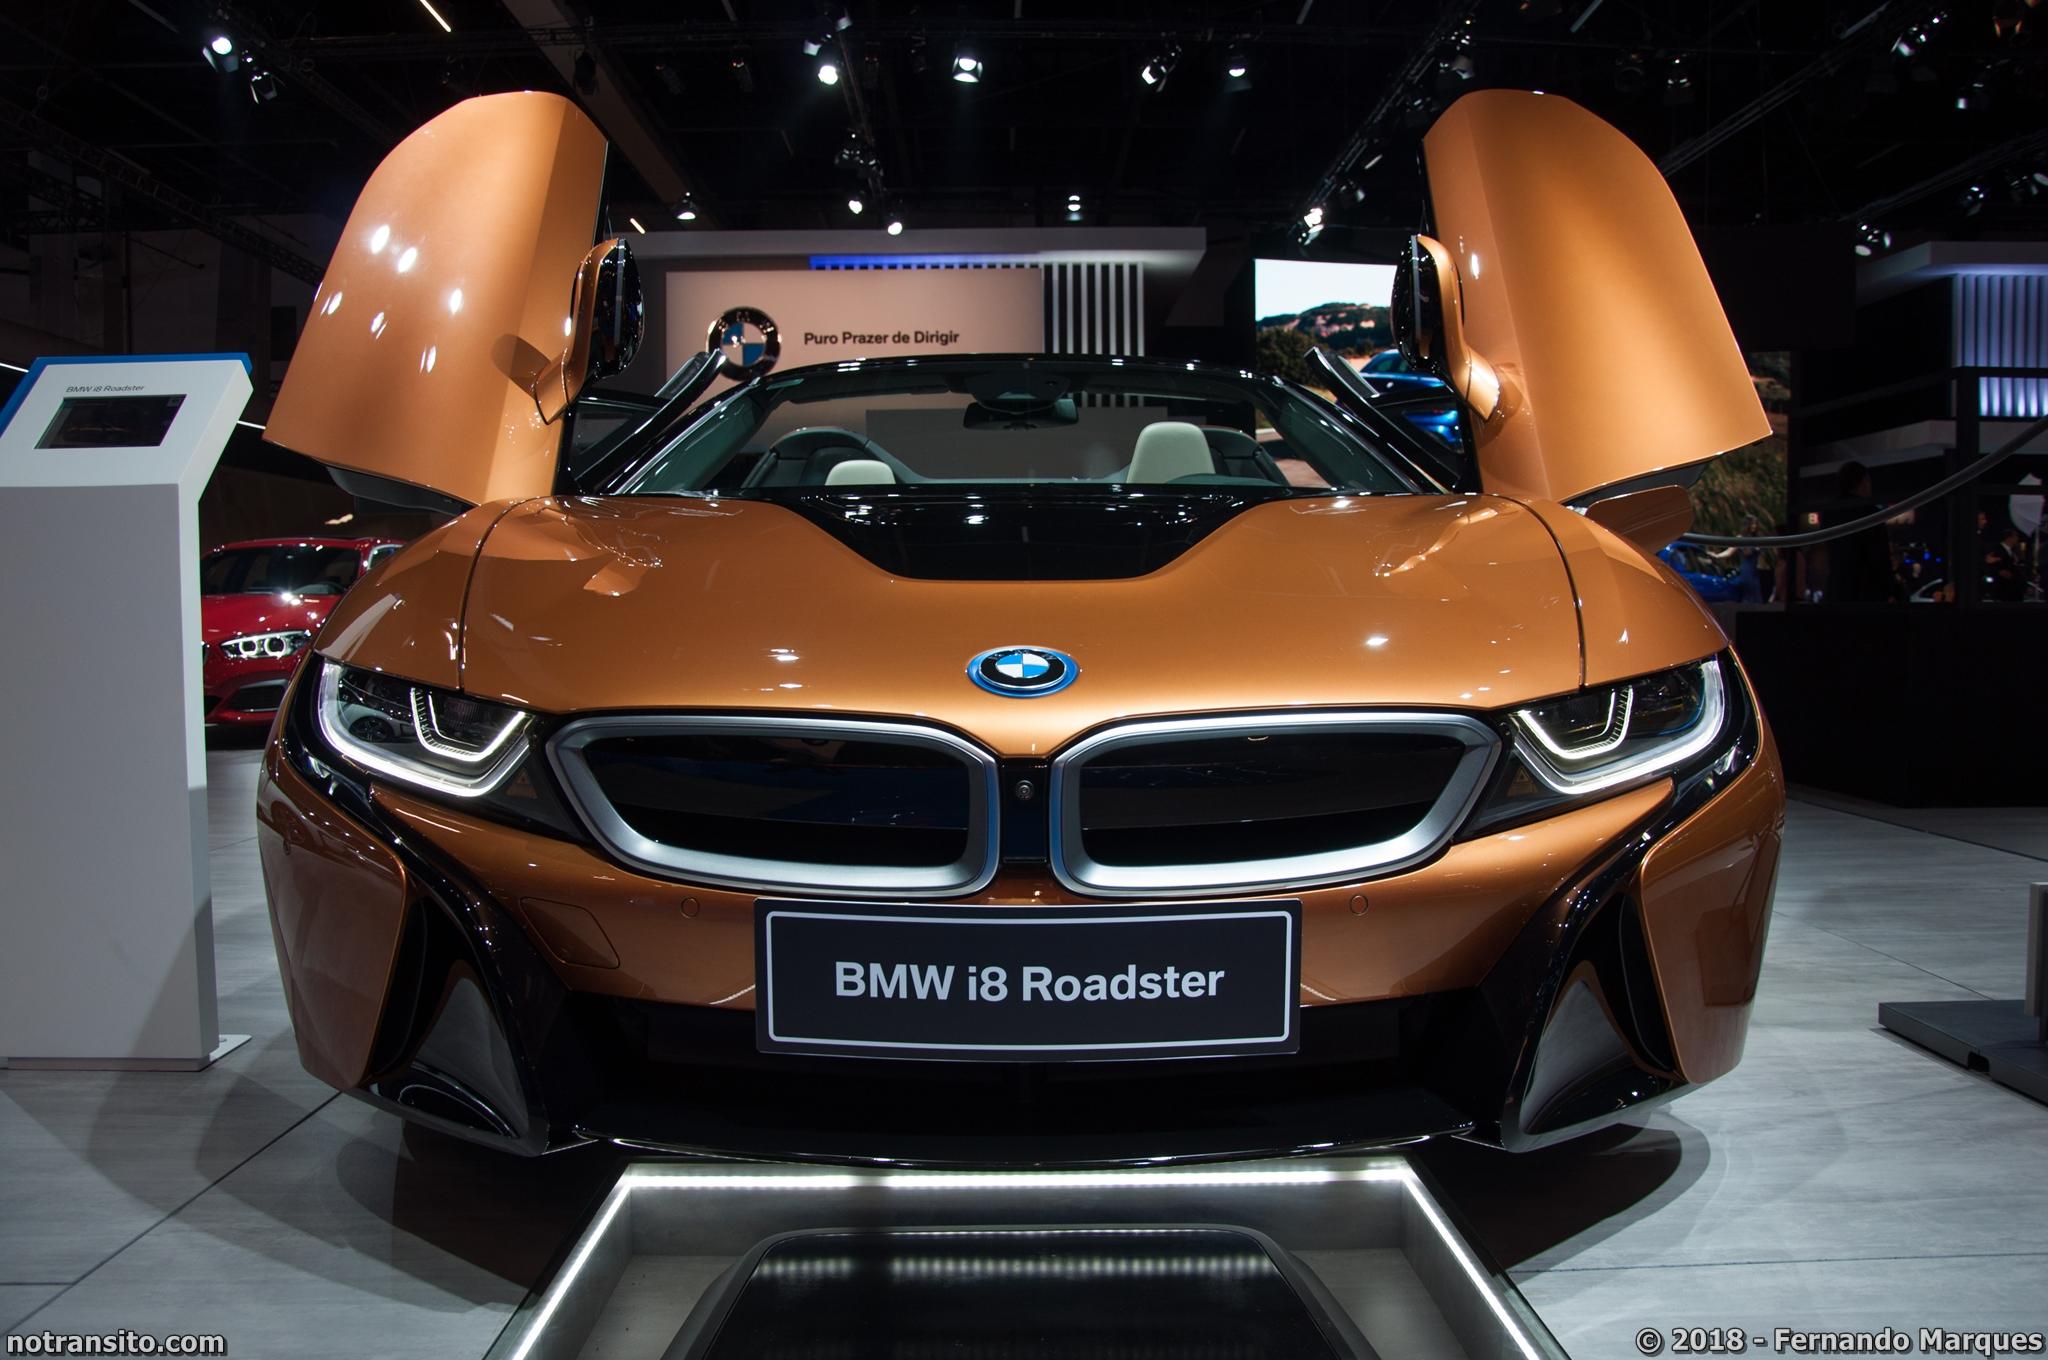 Salão2018-BMWi8Roadster-